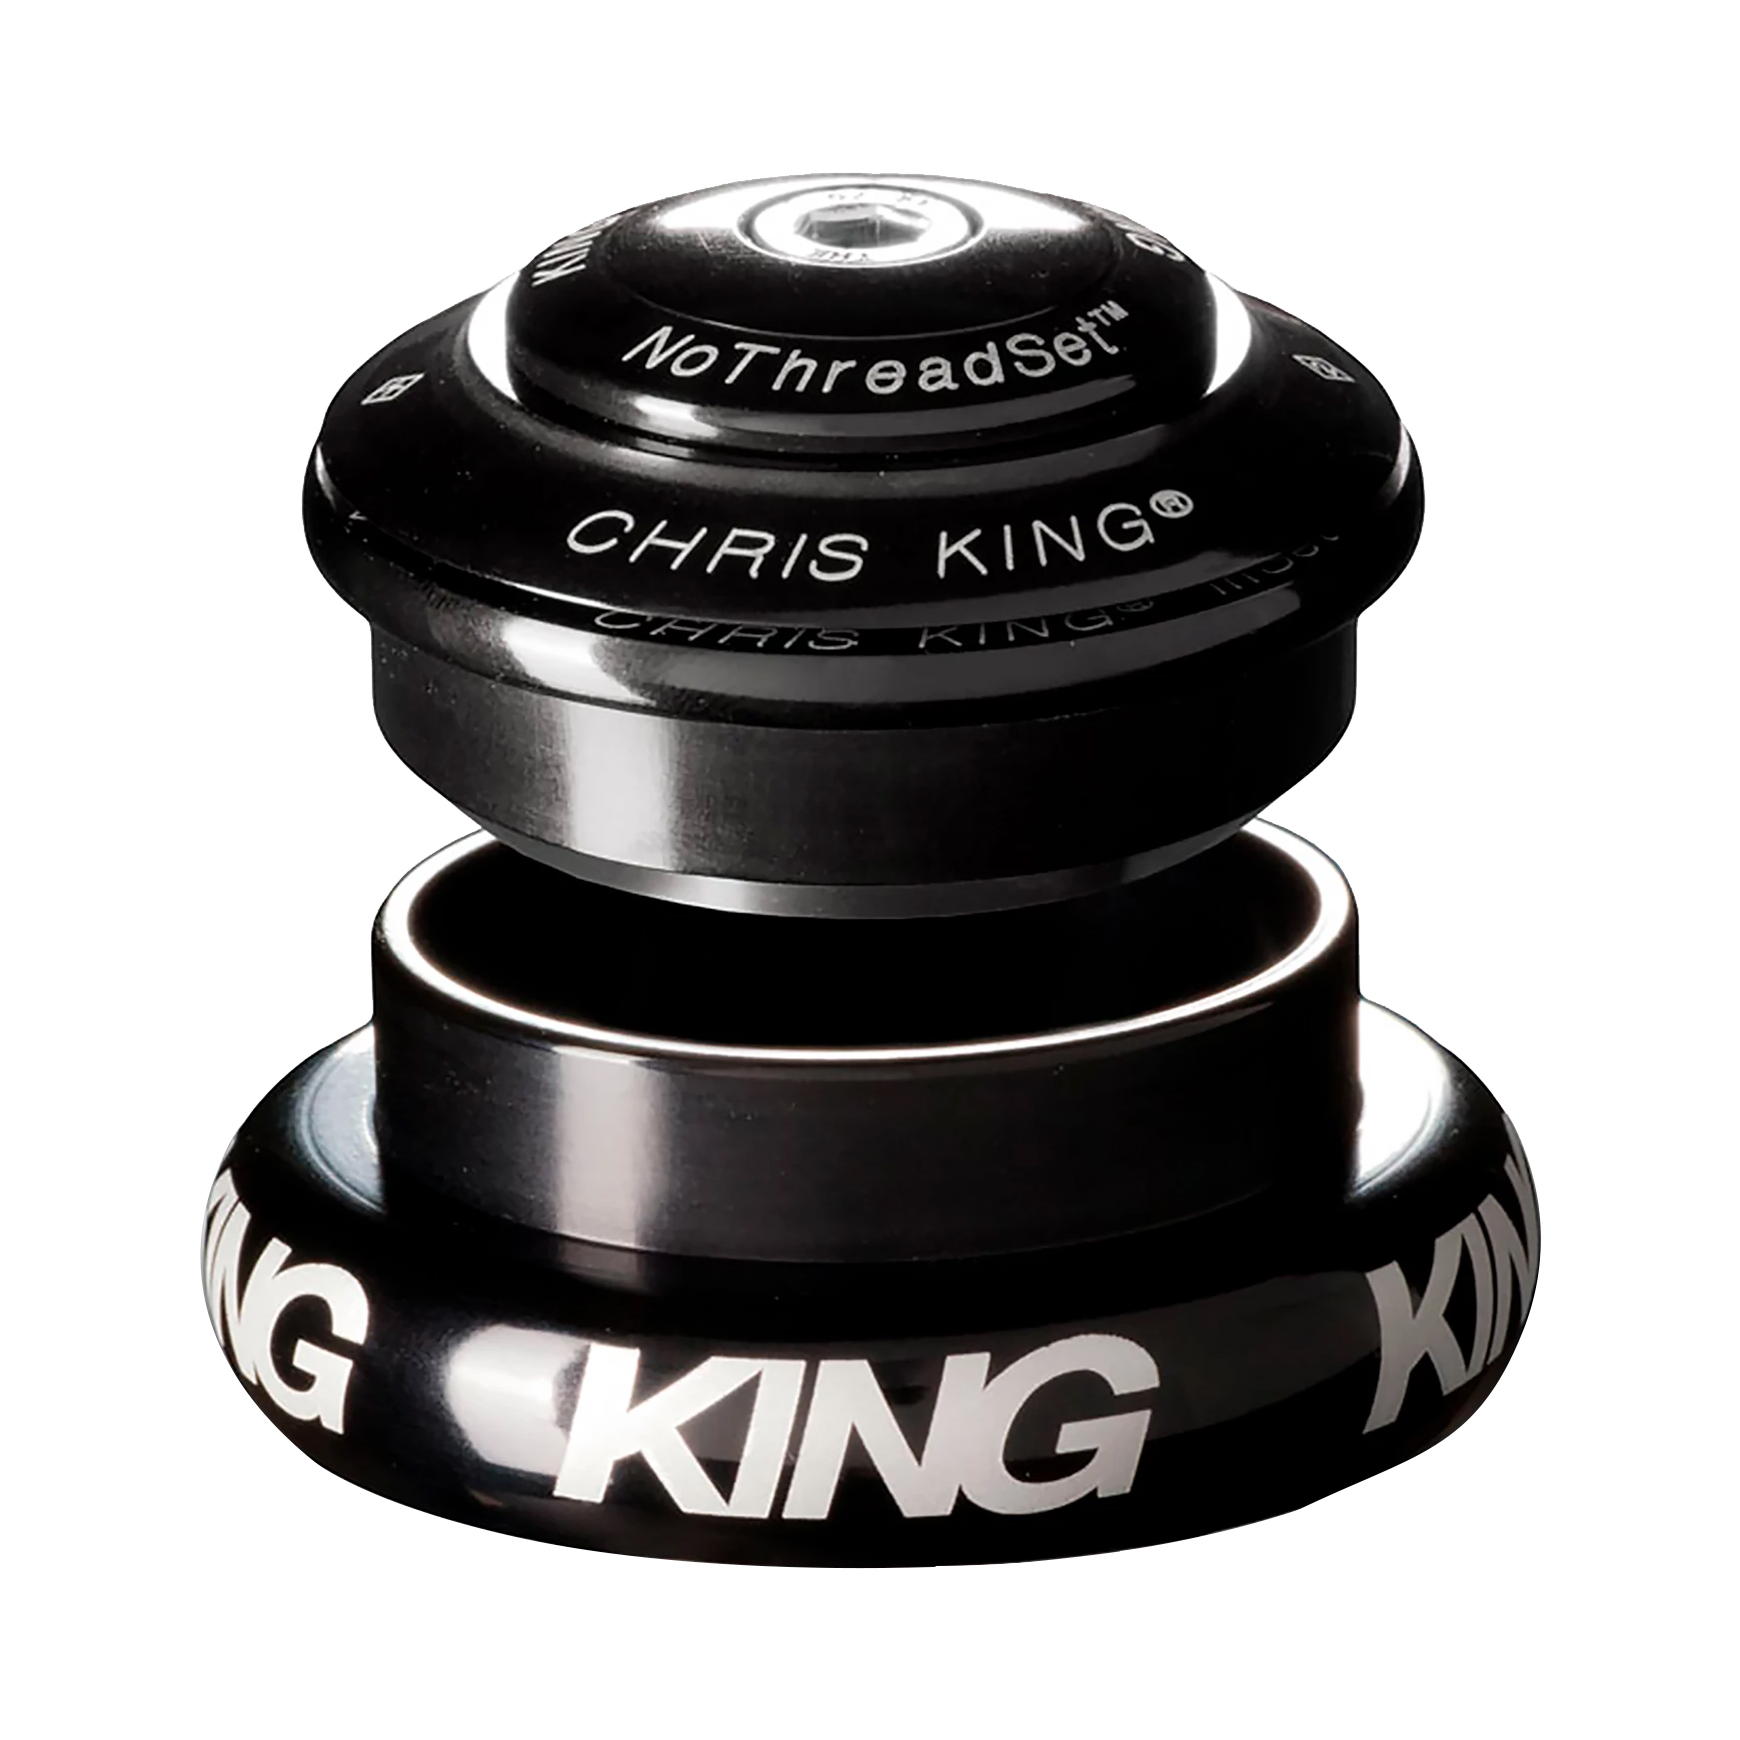 Chris King I7 Inset Headset